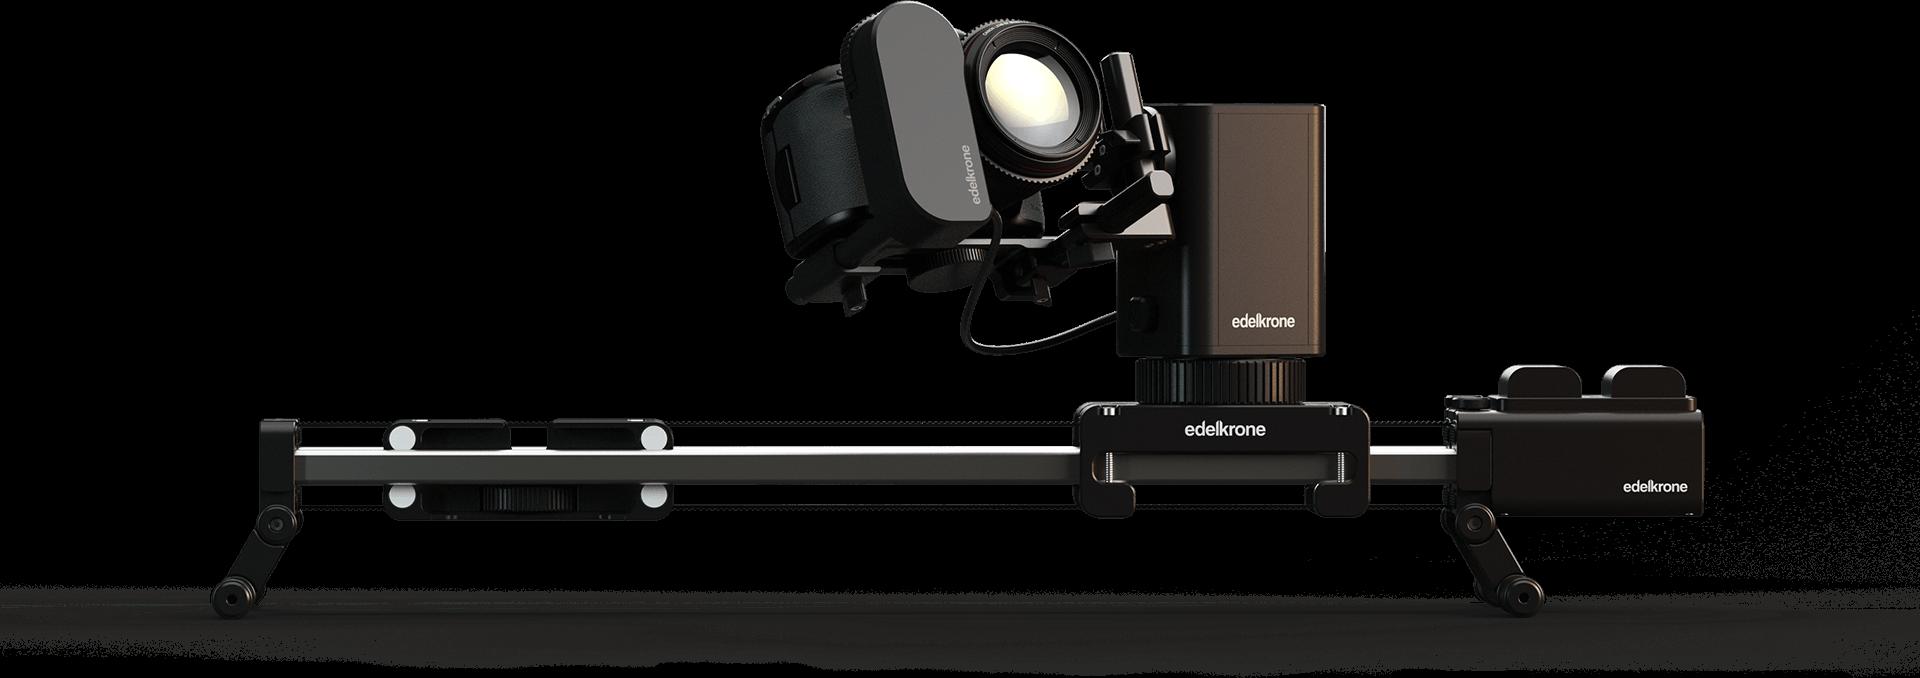 Edelkrone Motion Control System